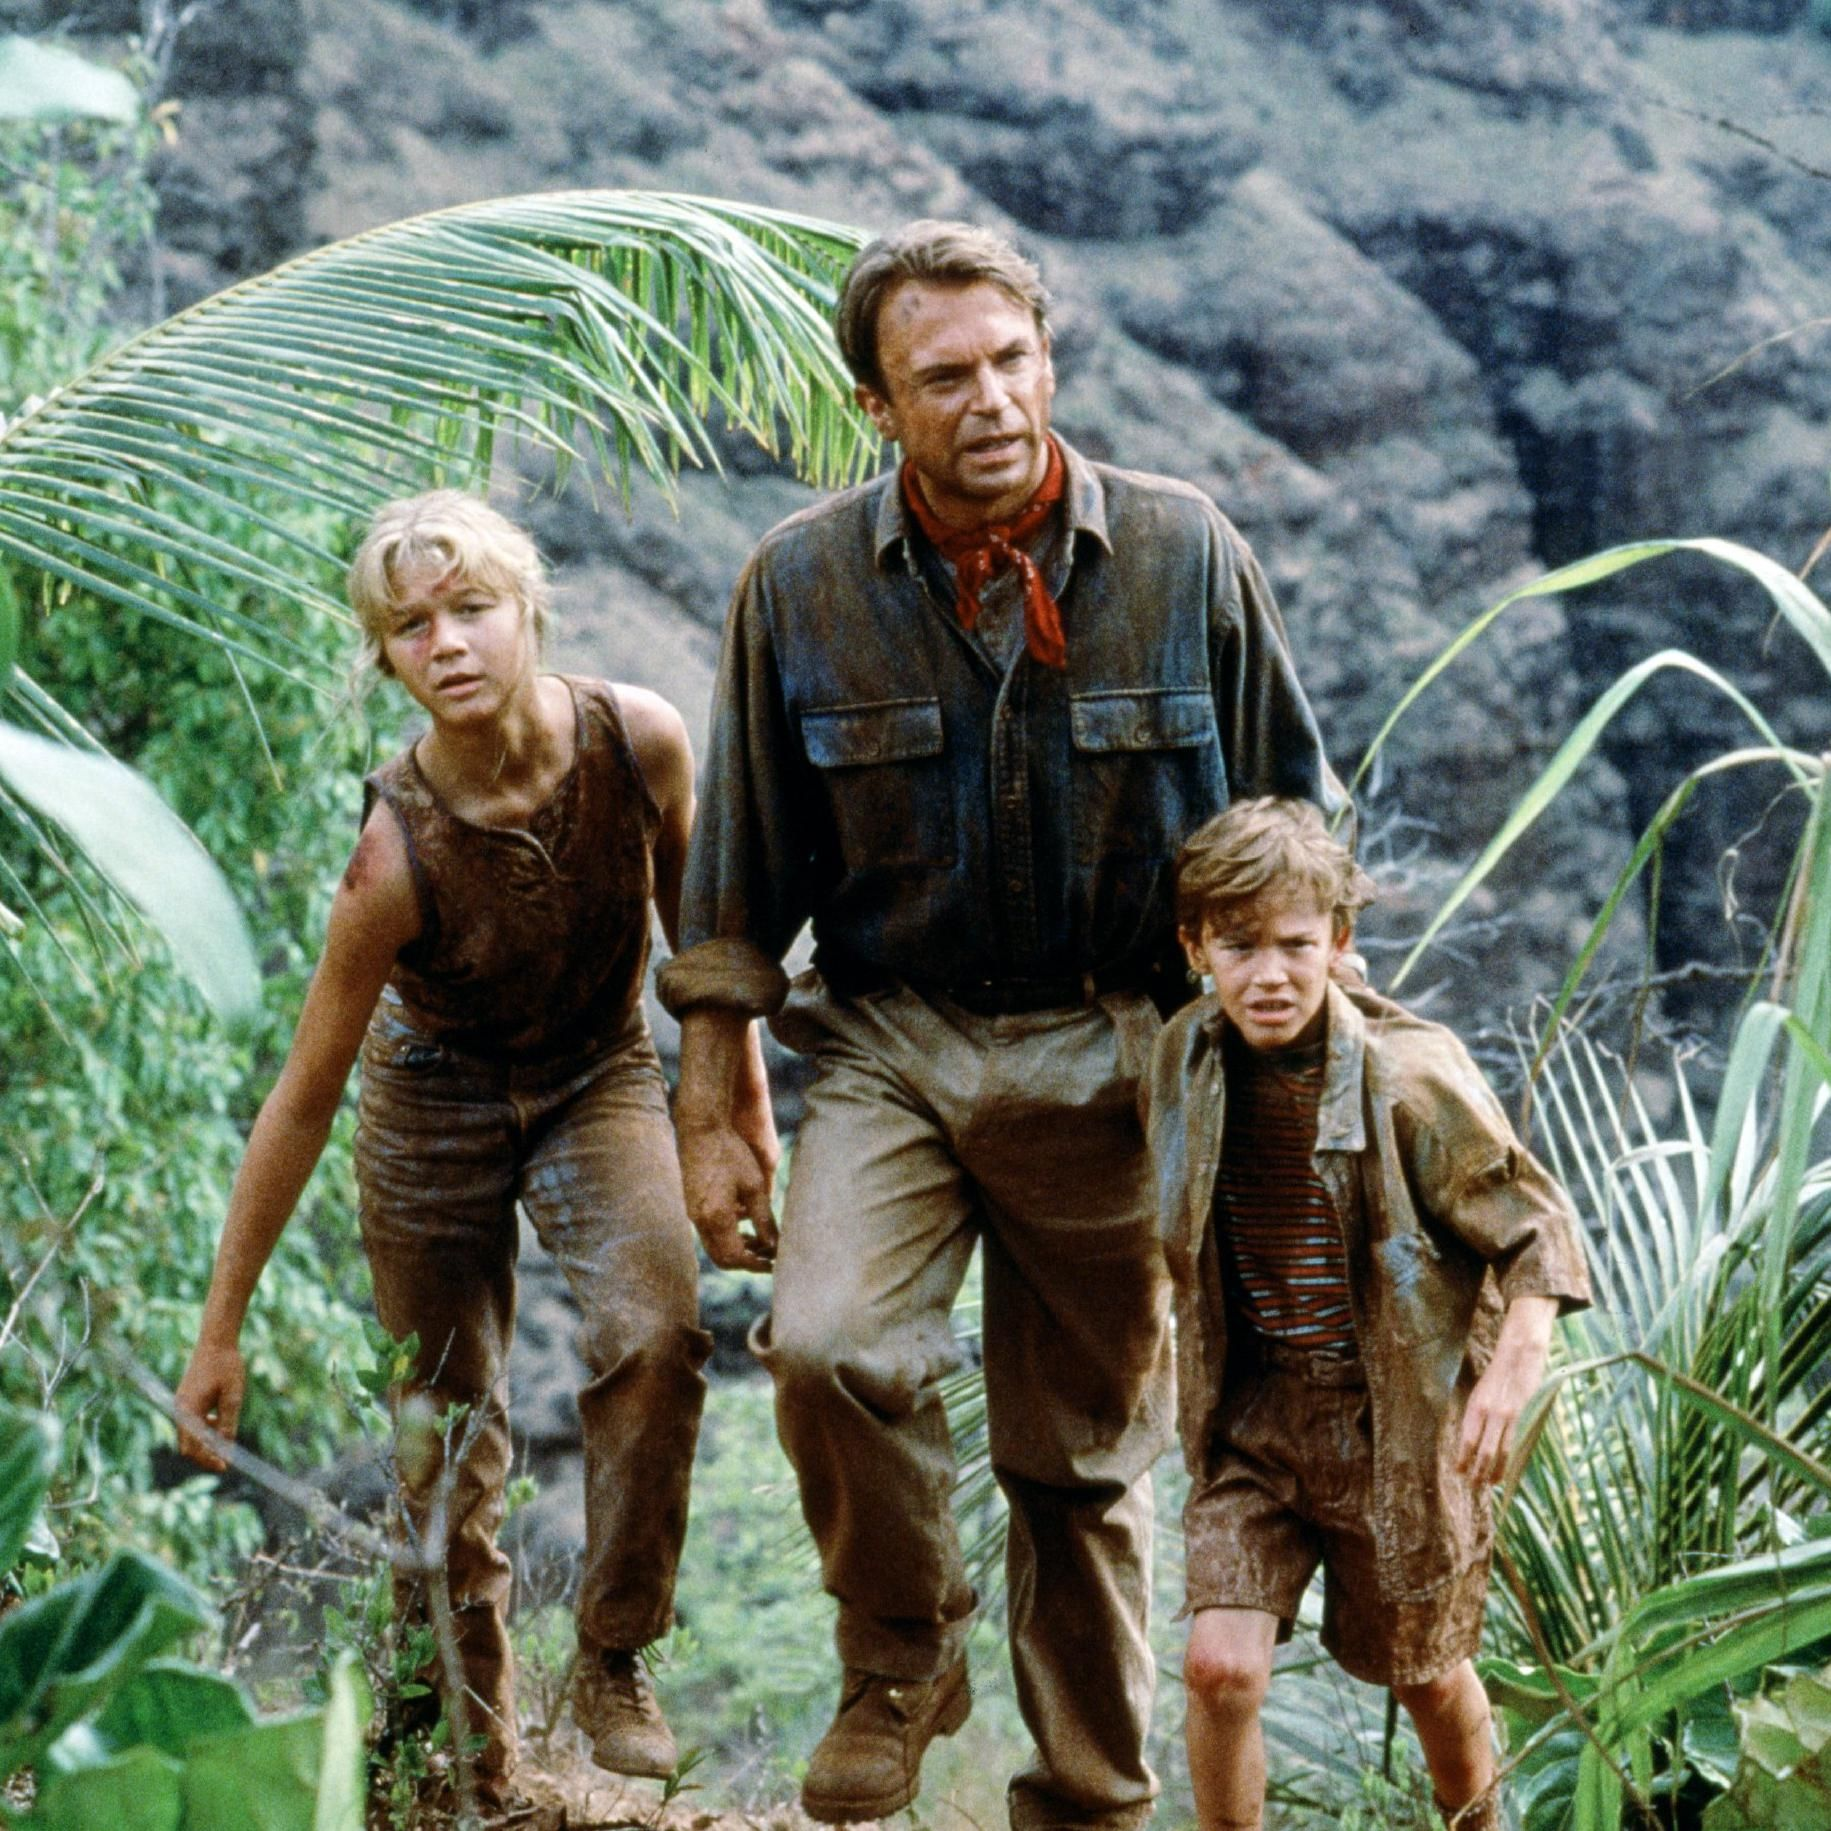 Idea by Richard Channing on Jurassic Park Jurassic park